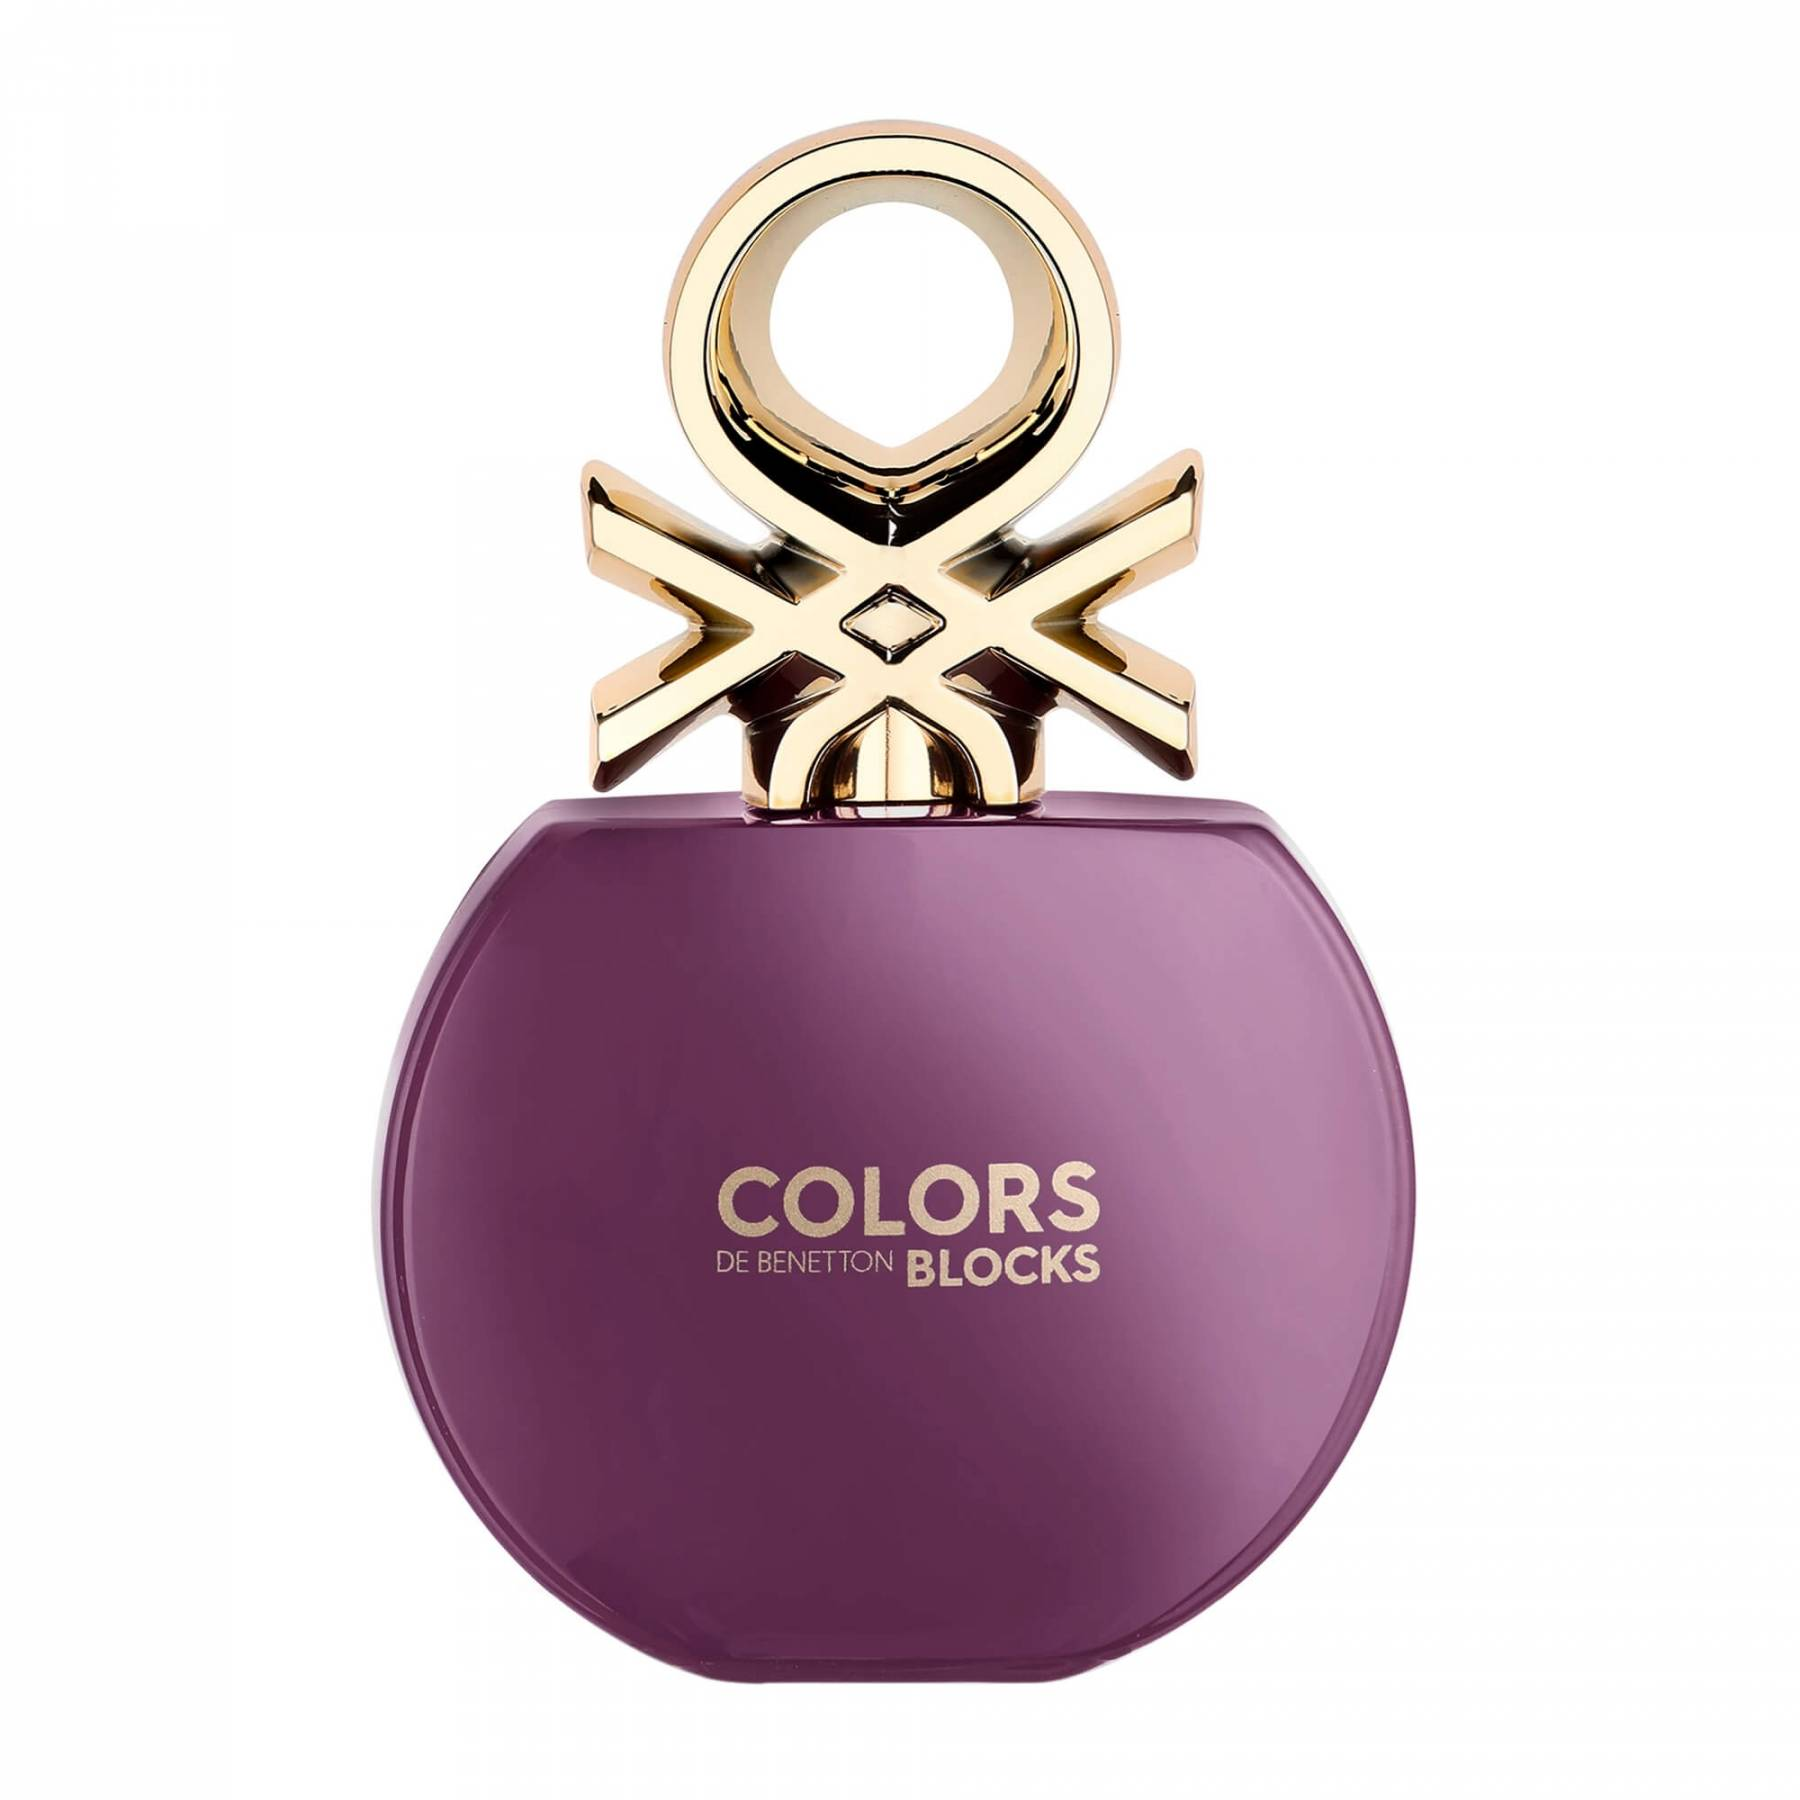 ادو تویلت زنانه بنتون مدل Colors de Benetton Blocks Purple حجم 80 میلی لیتر